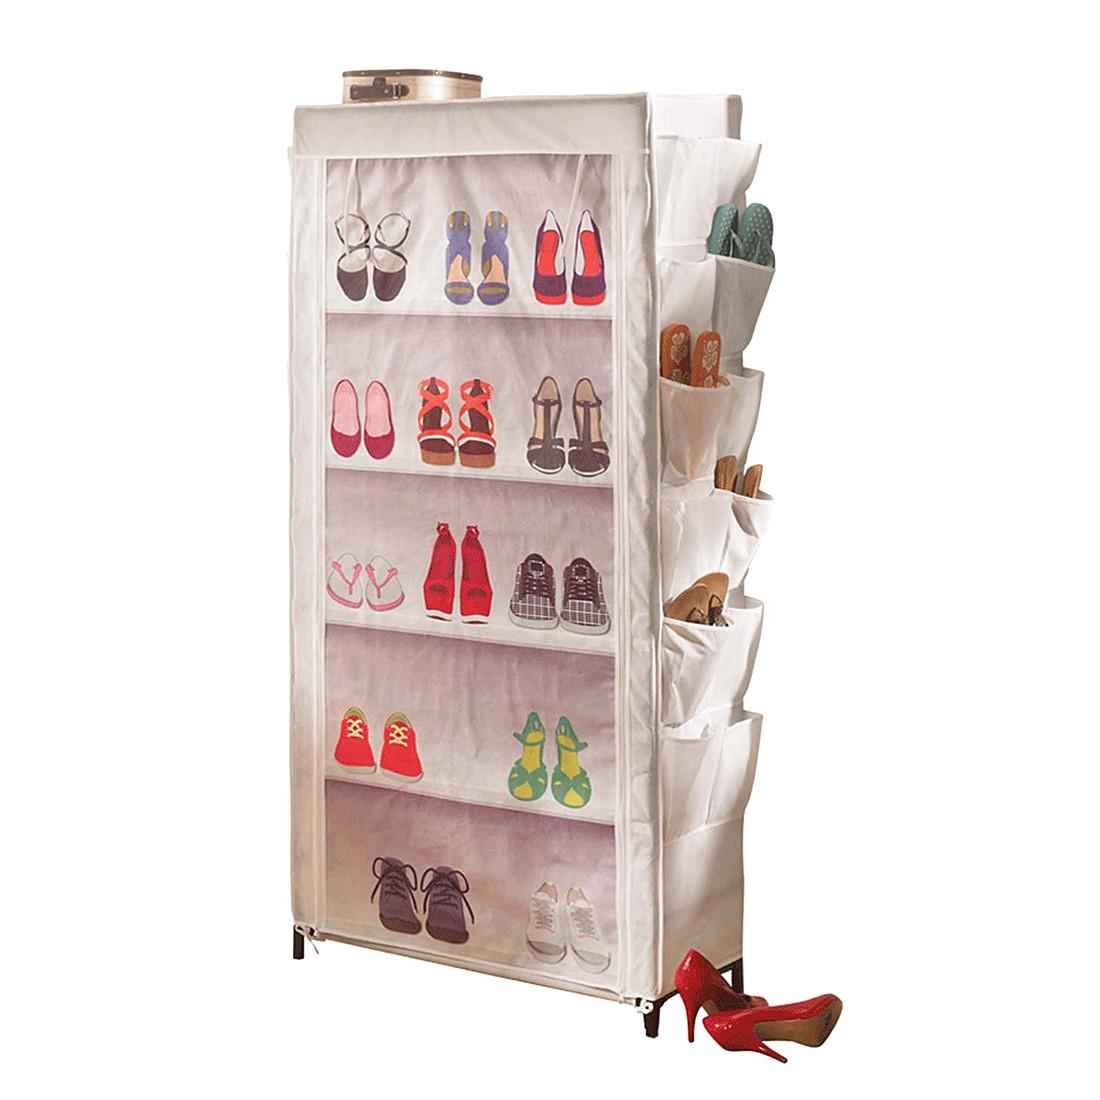 Schuhregal Shoes – Metall/Vlies – Weiß, PureDay jetzt bestellen